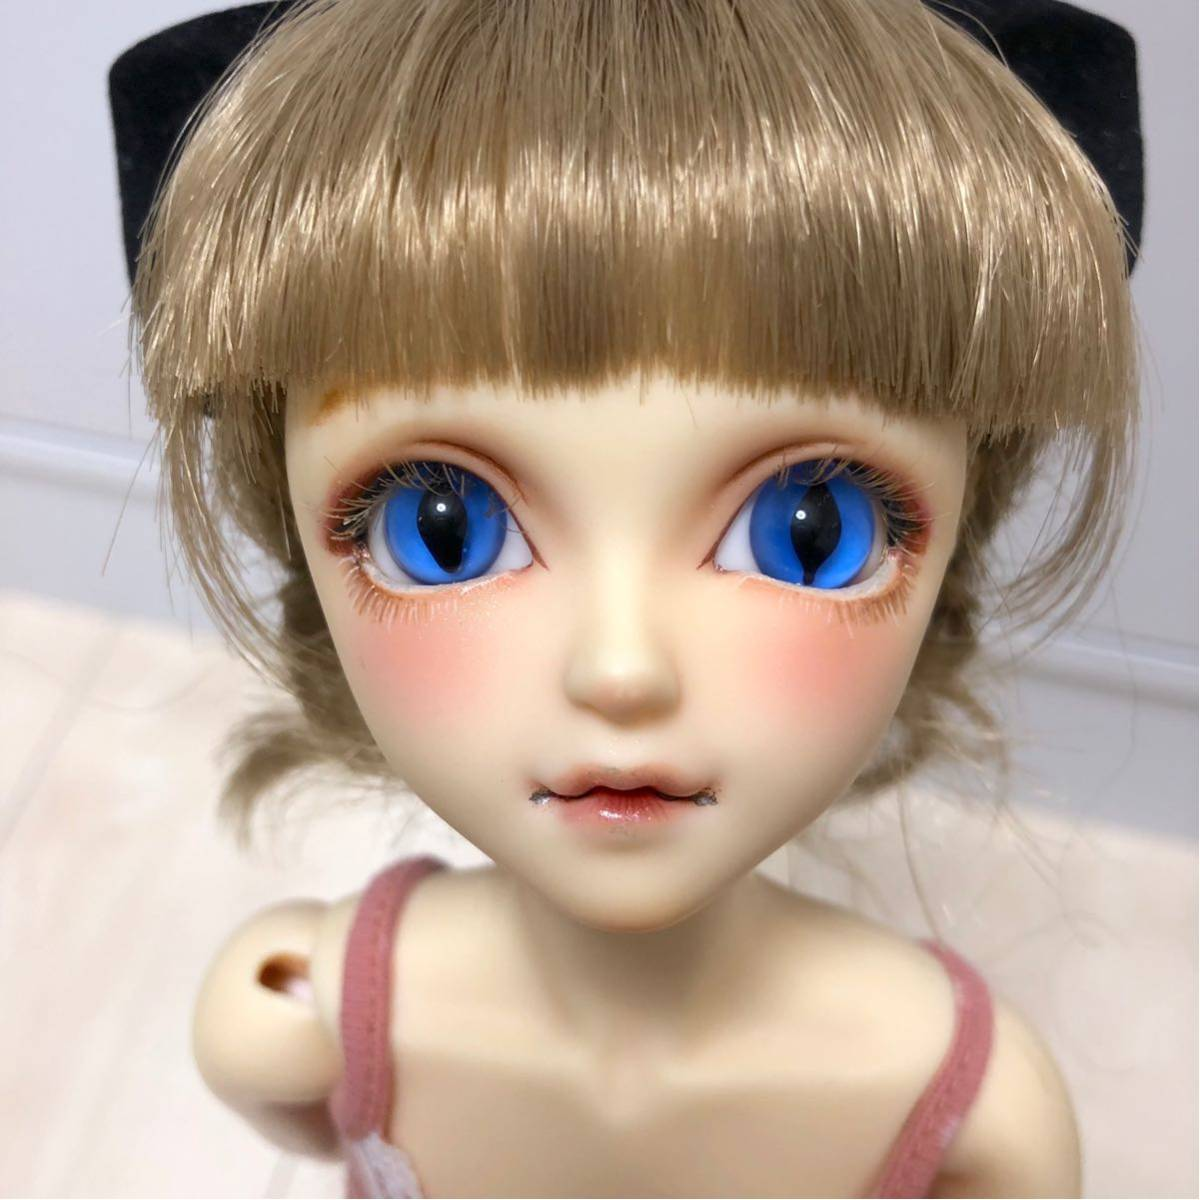 SDCute 女の子 Rene(黒猫ルネ)SDC すわりこタイプ